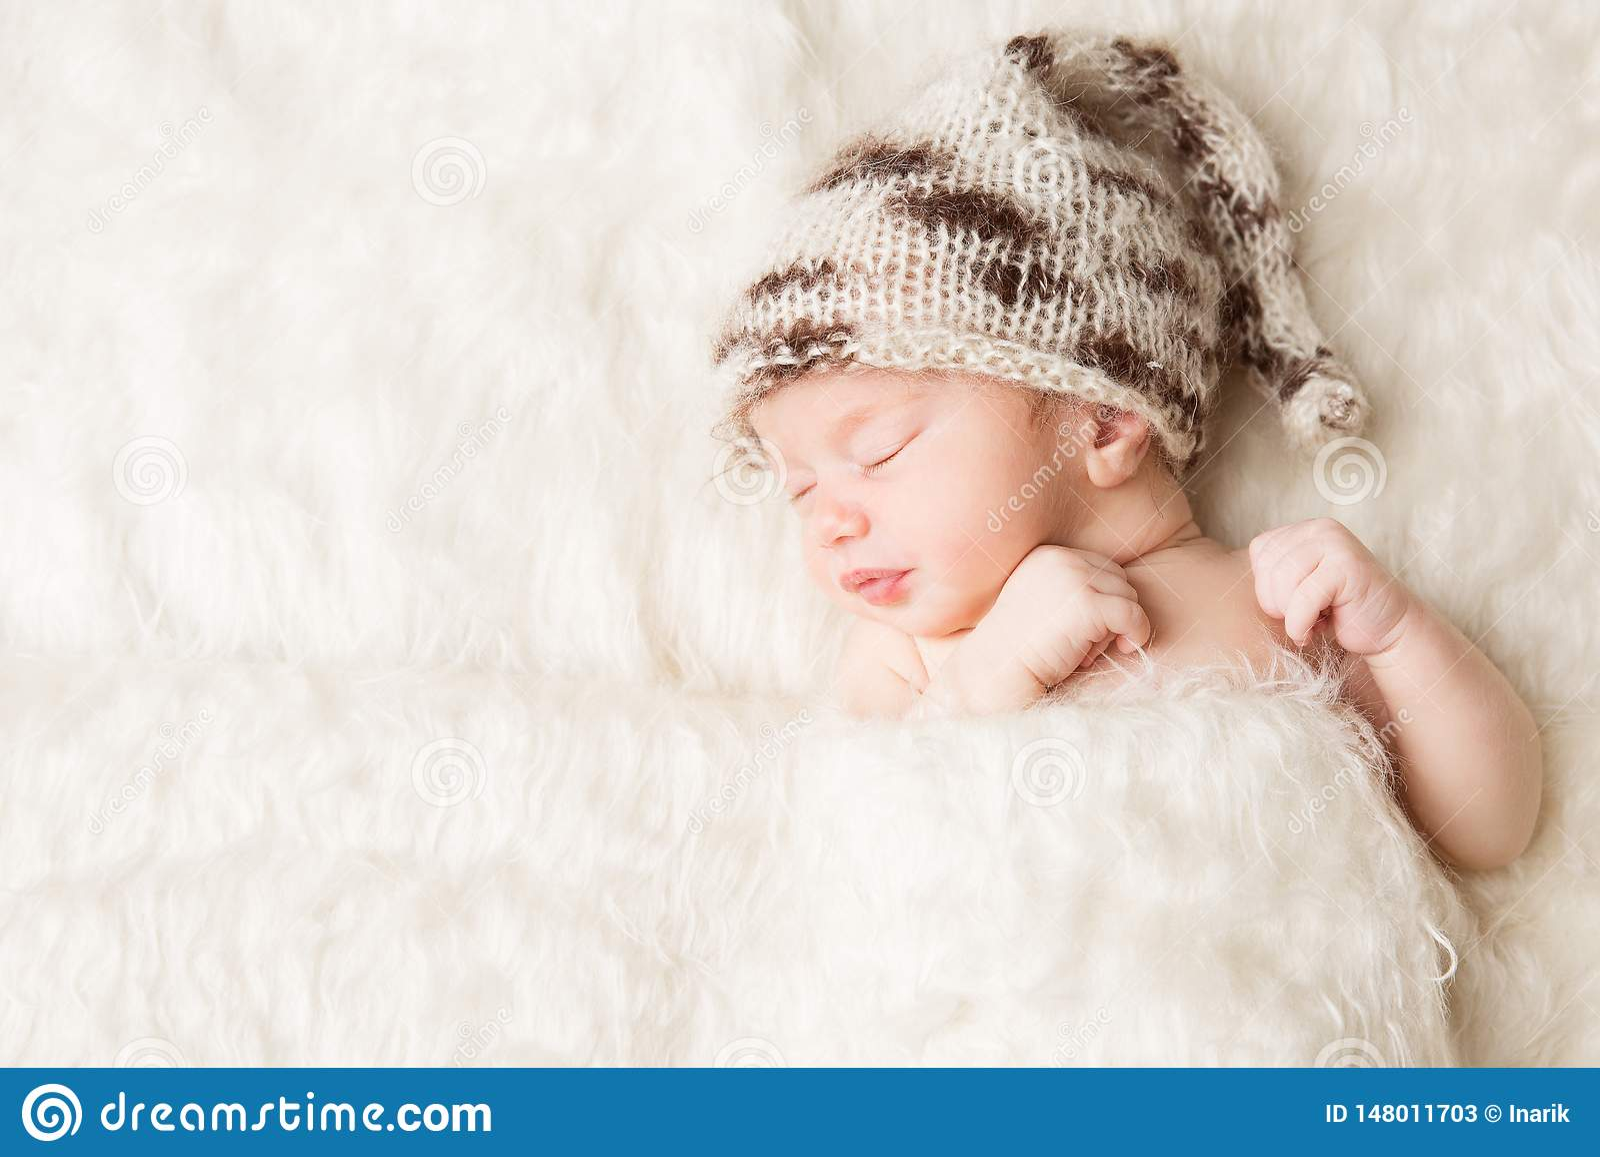 Newborn, baby sleeping in white bed, beautiful new born infant portrait